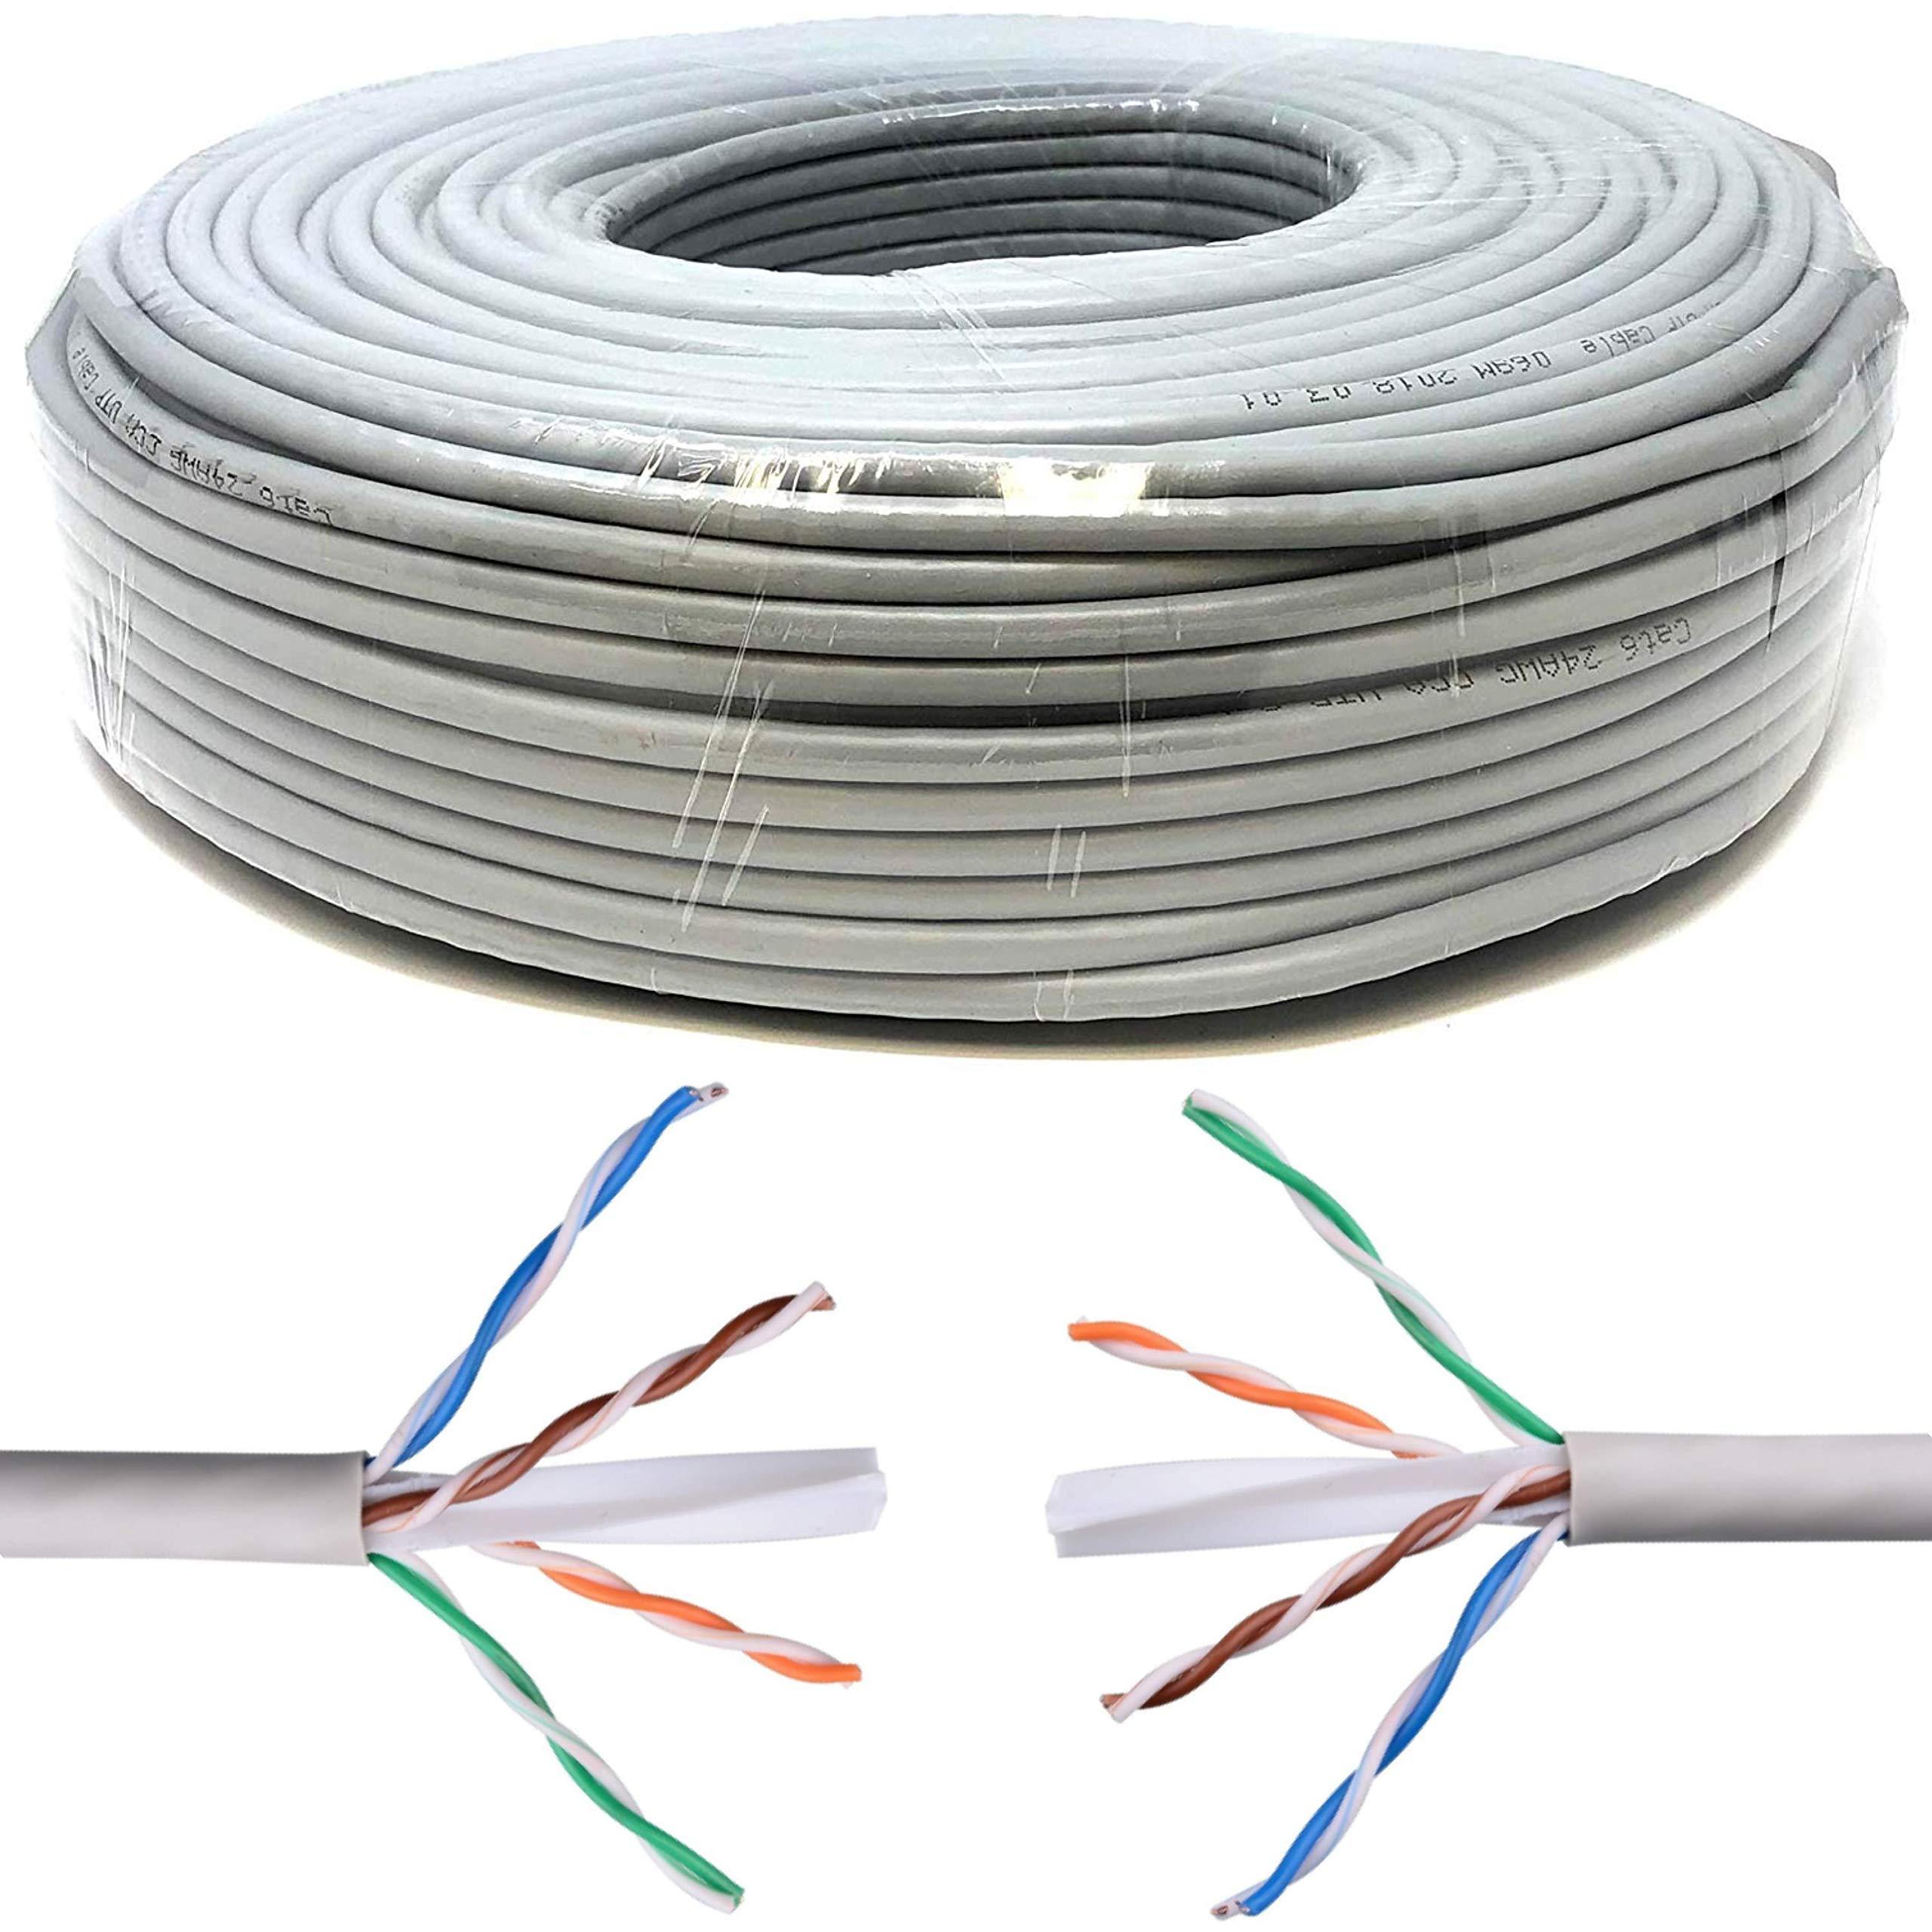 50M CAT6 ETHERNET Pure Copper Cable Reel//Drum GIGABIT UTP Network LAN RJ45